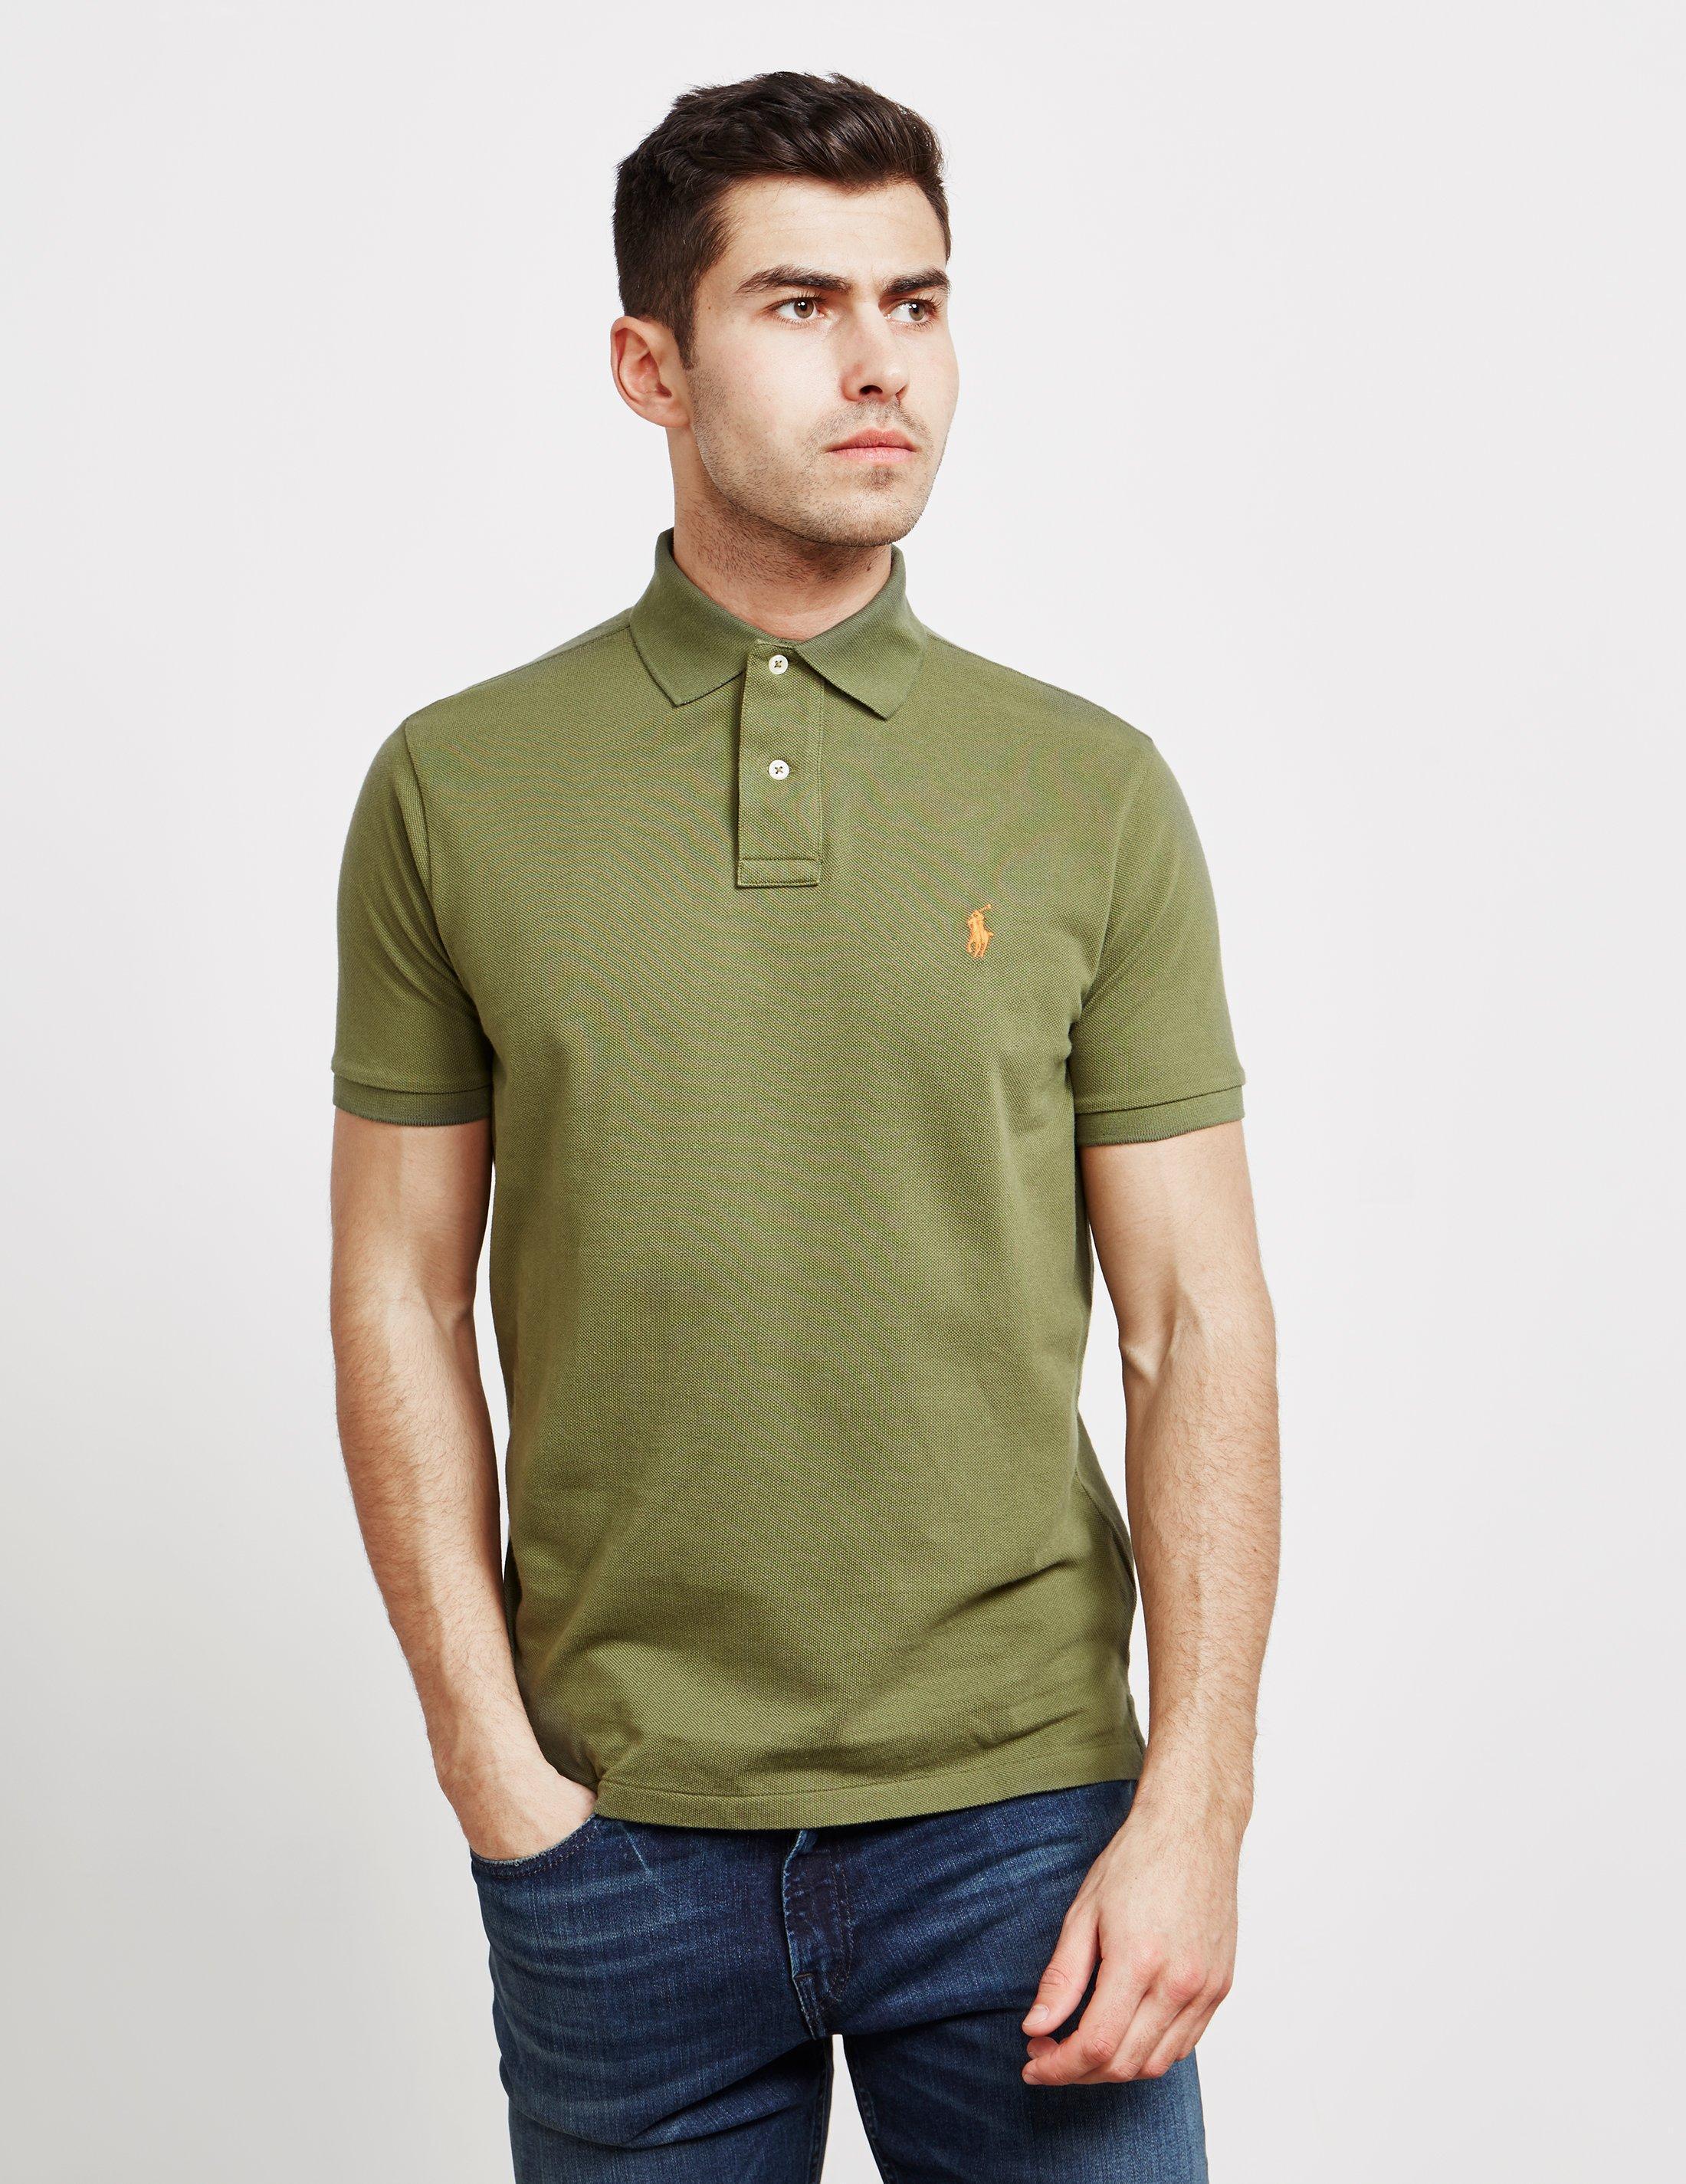 dfe62525d6328 Lyst - Polo Ralph Lauren Mens Mesh Short Sleeve Polo Shirt Green in ...